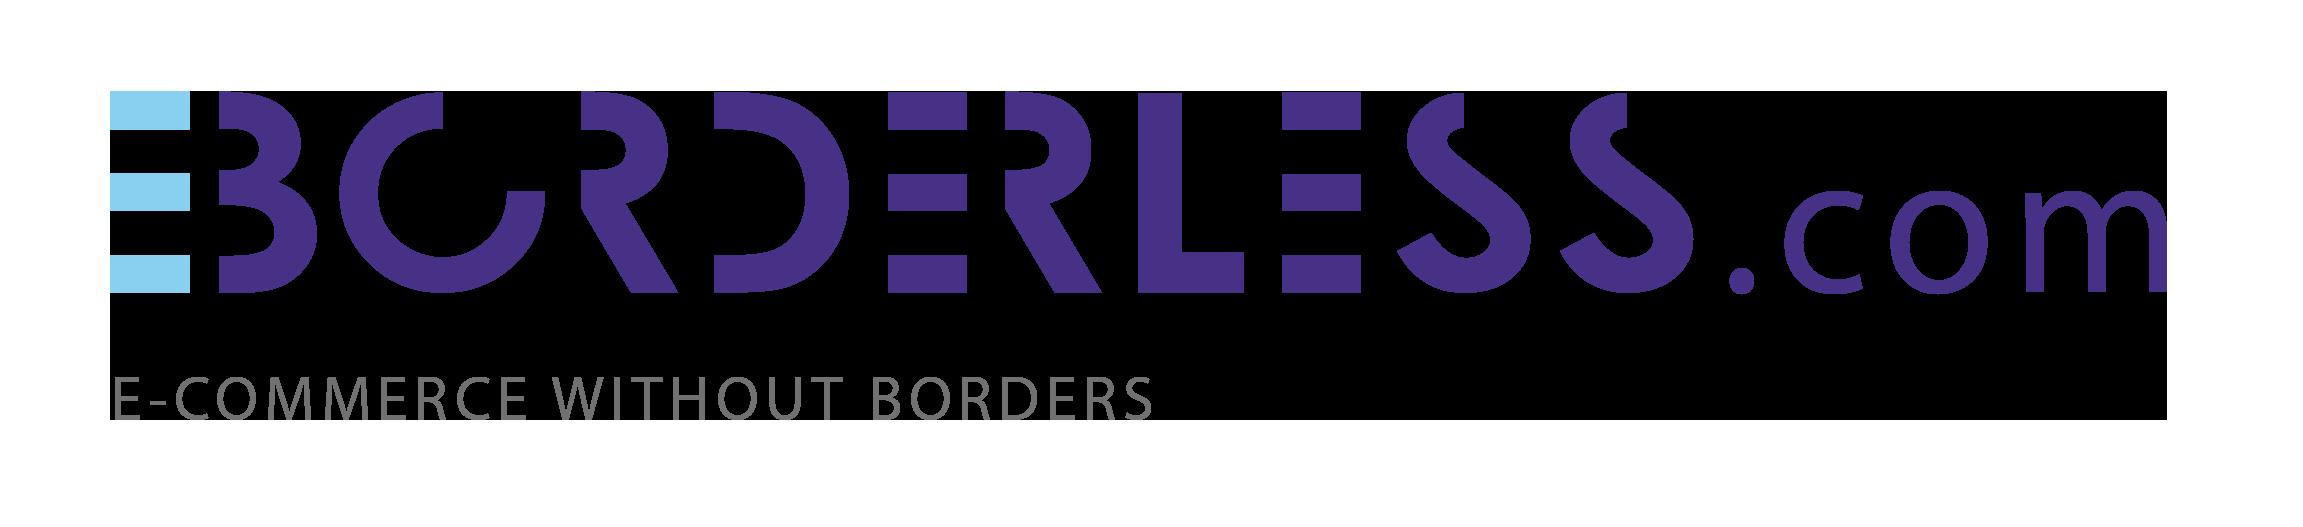 eBorderless